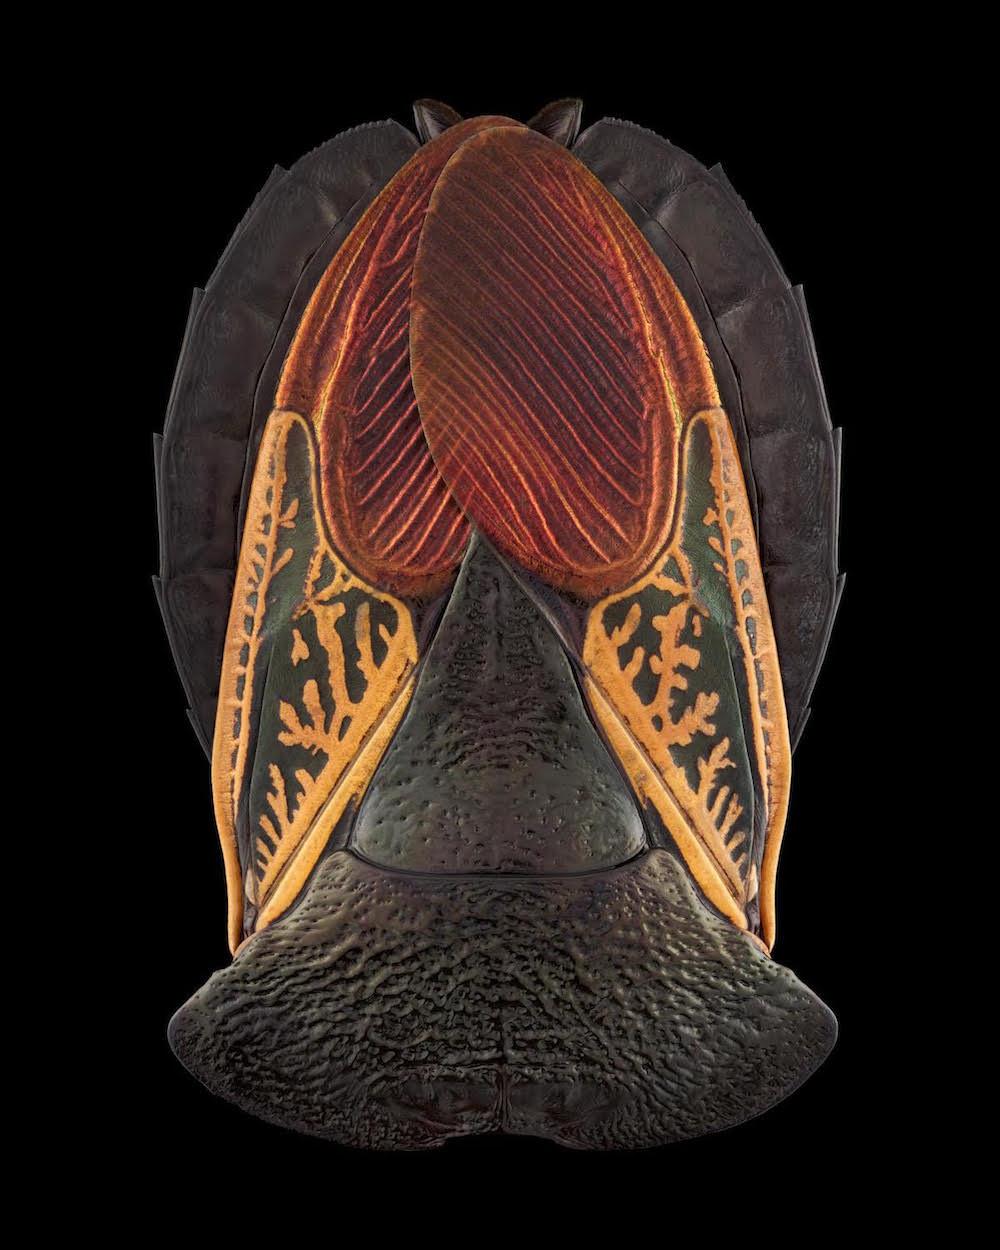 fotografia-macro-insetti-volti-mascherati-pascal-goet-5